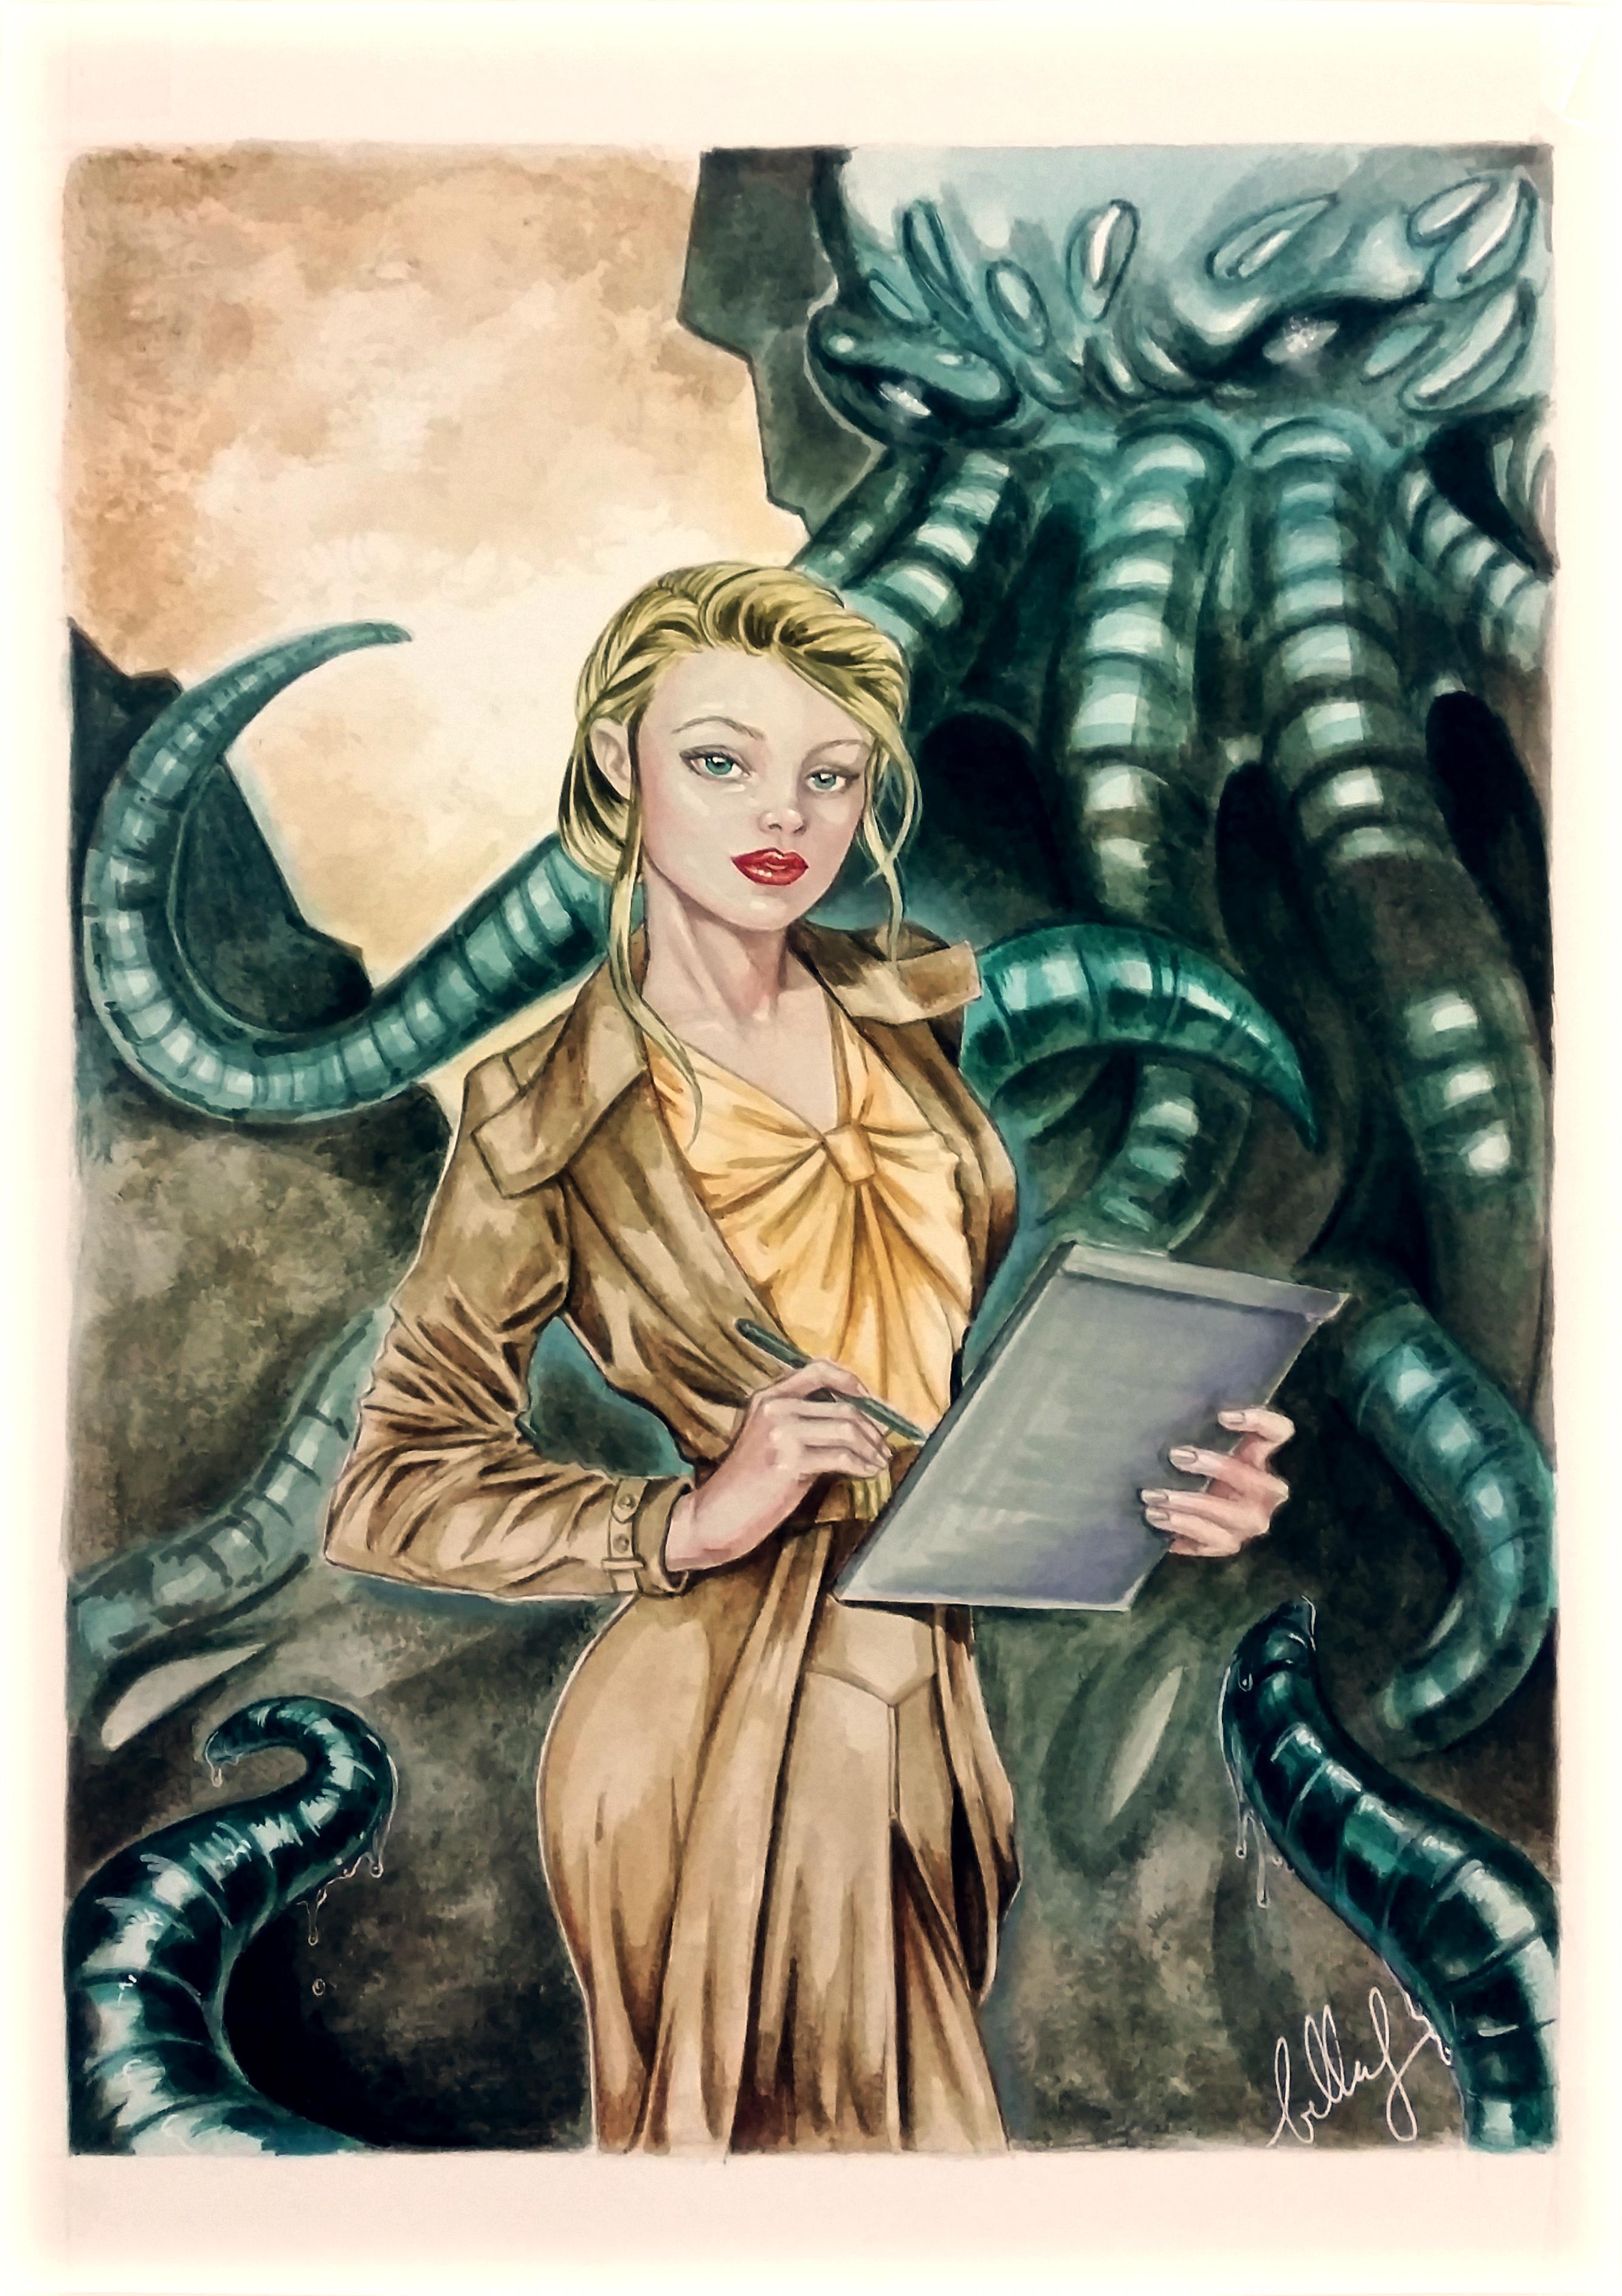 H.P. Lovecraft comission